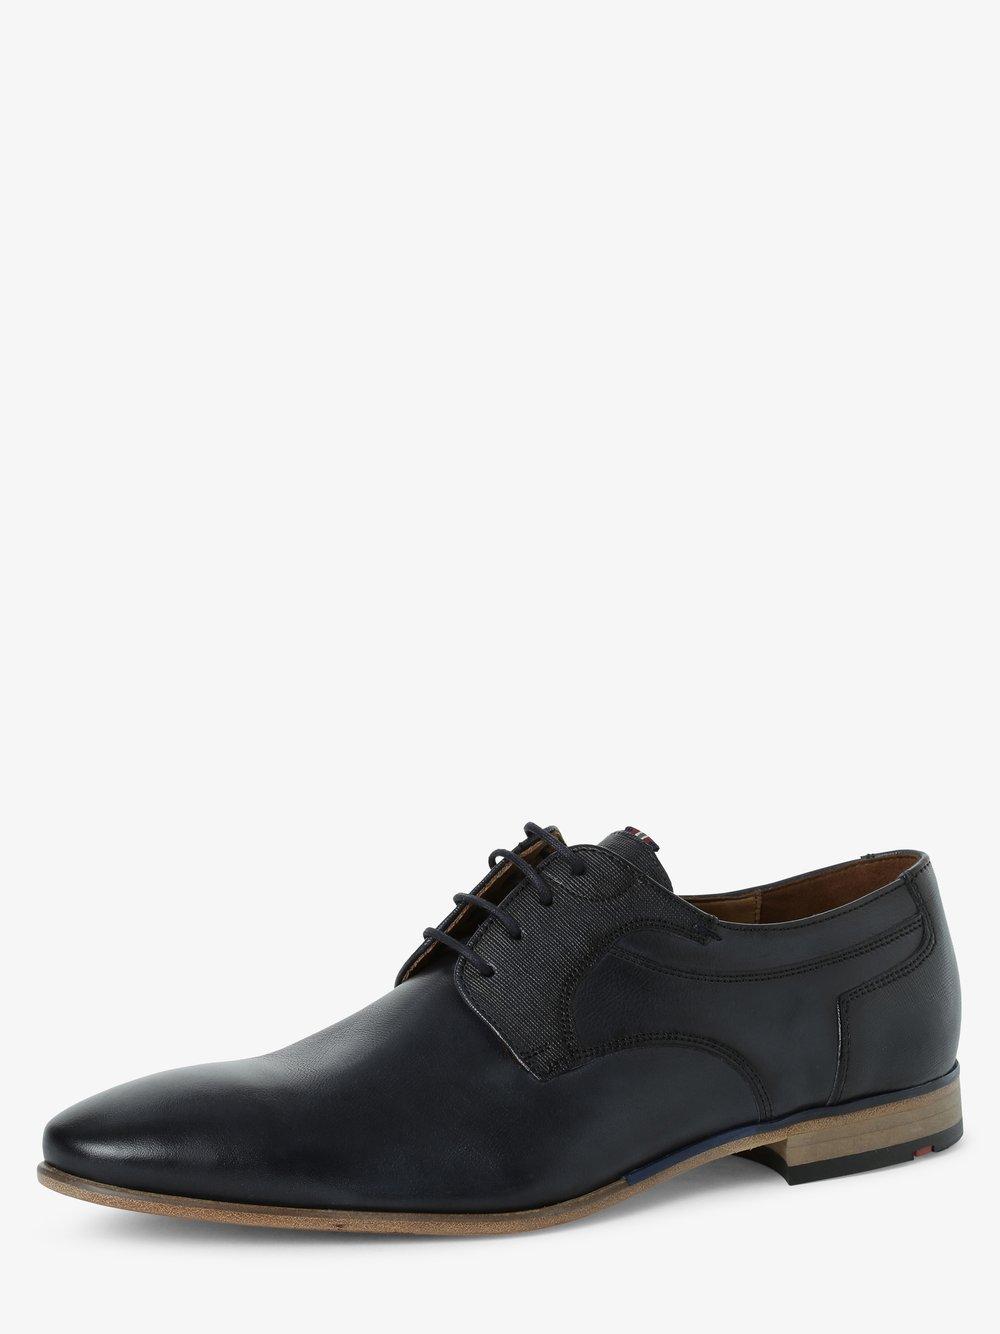 Lloyd – Męskie buty sznurowane ze skóry – Dargun, niebieski Van Graaf 468868-0001-00090